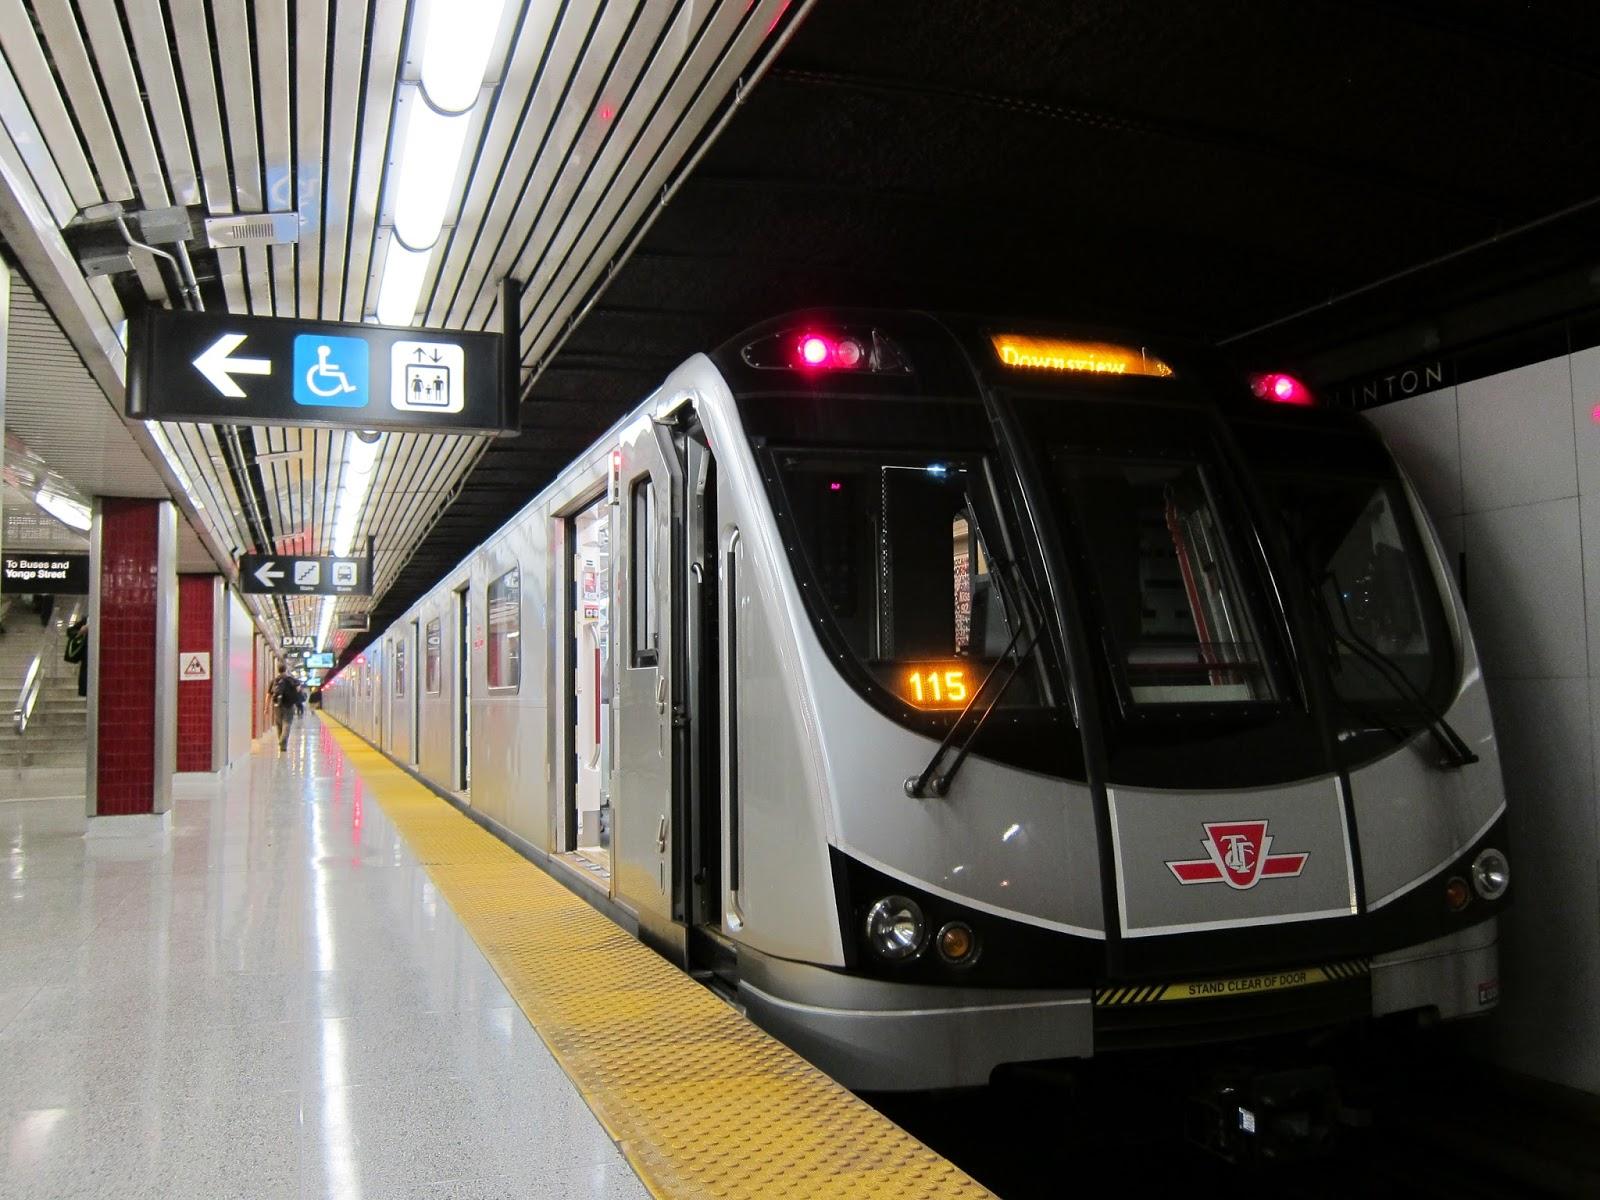 TTC Pape Station Upgrade, Toronto